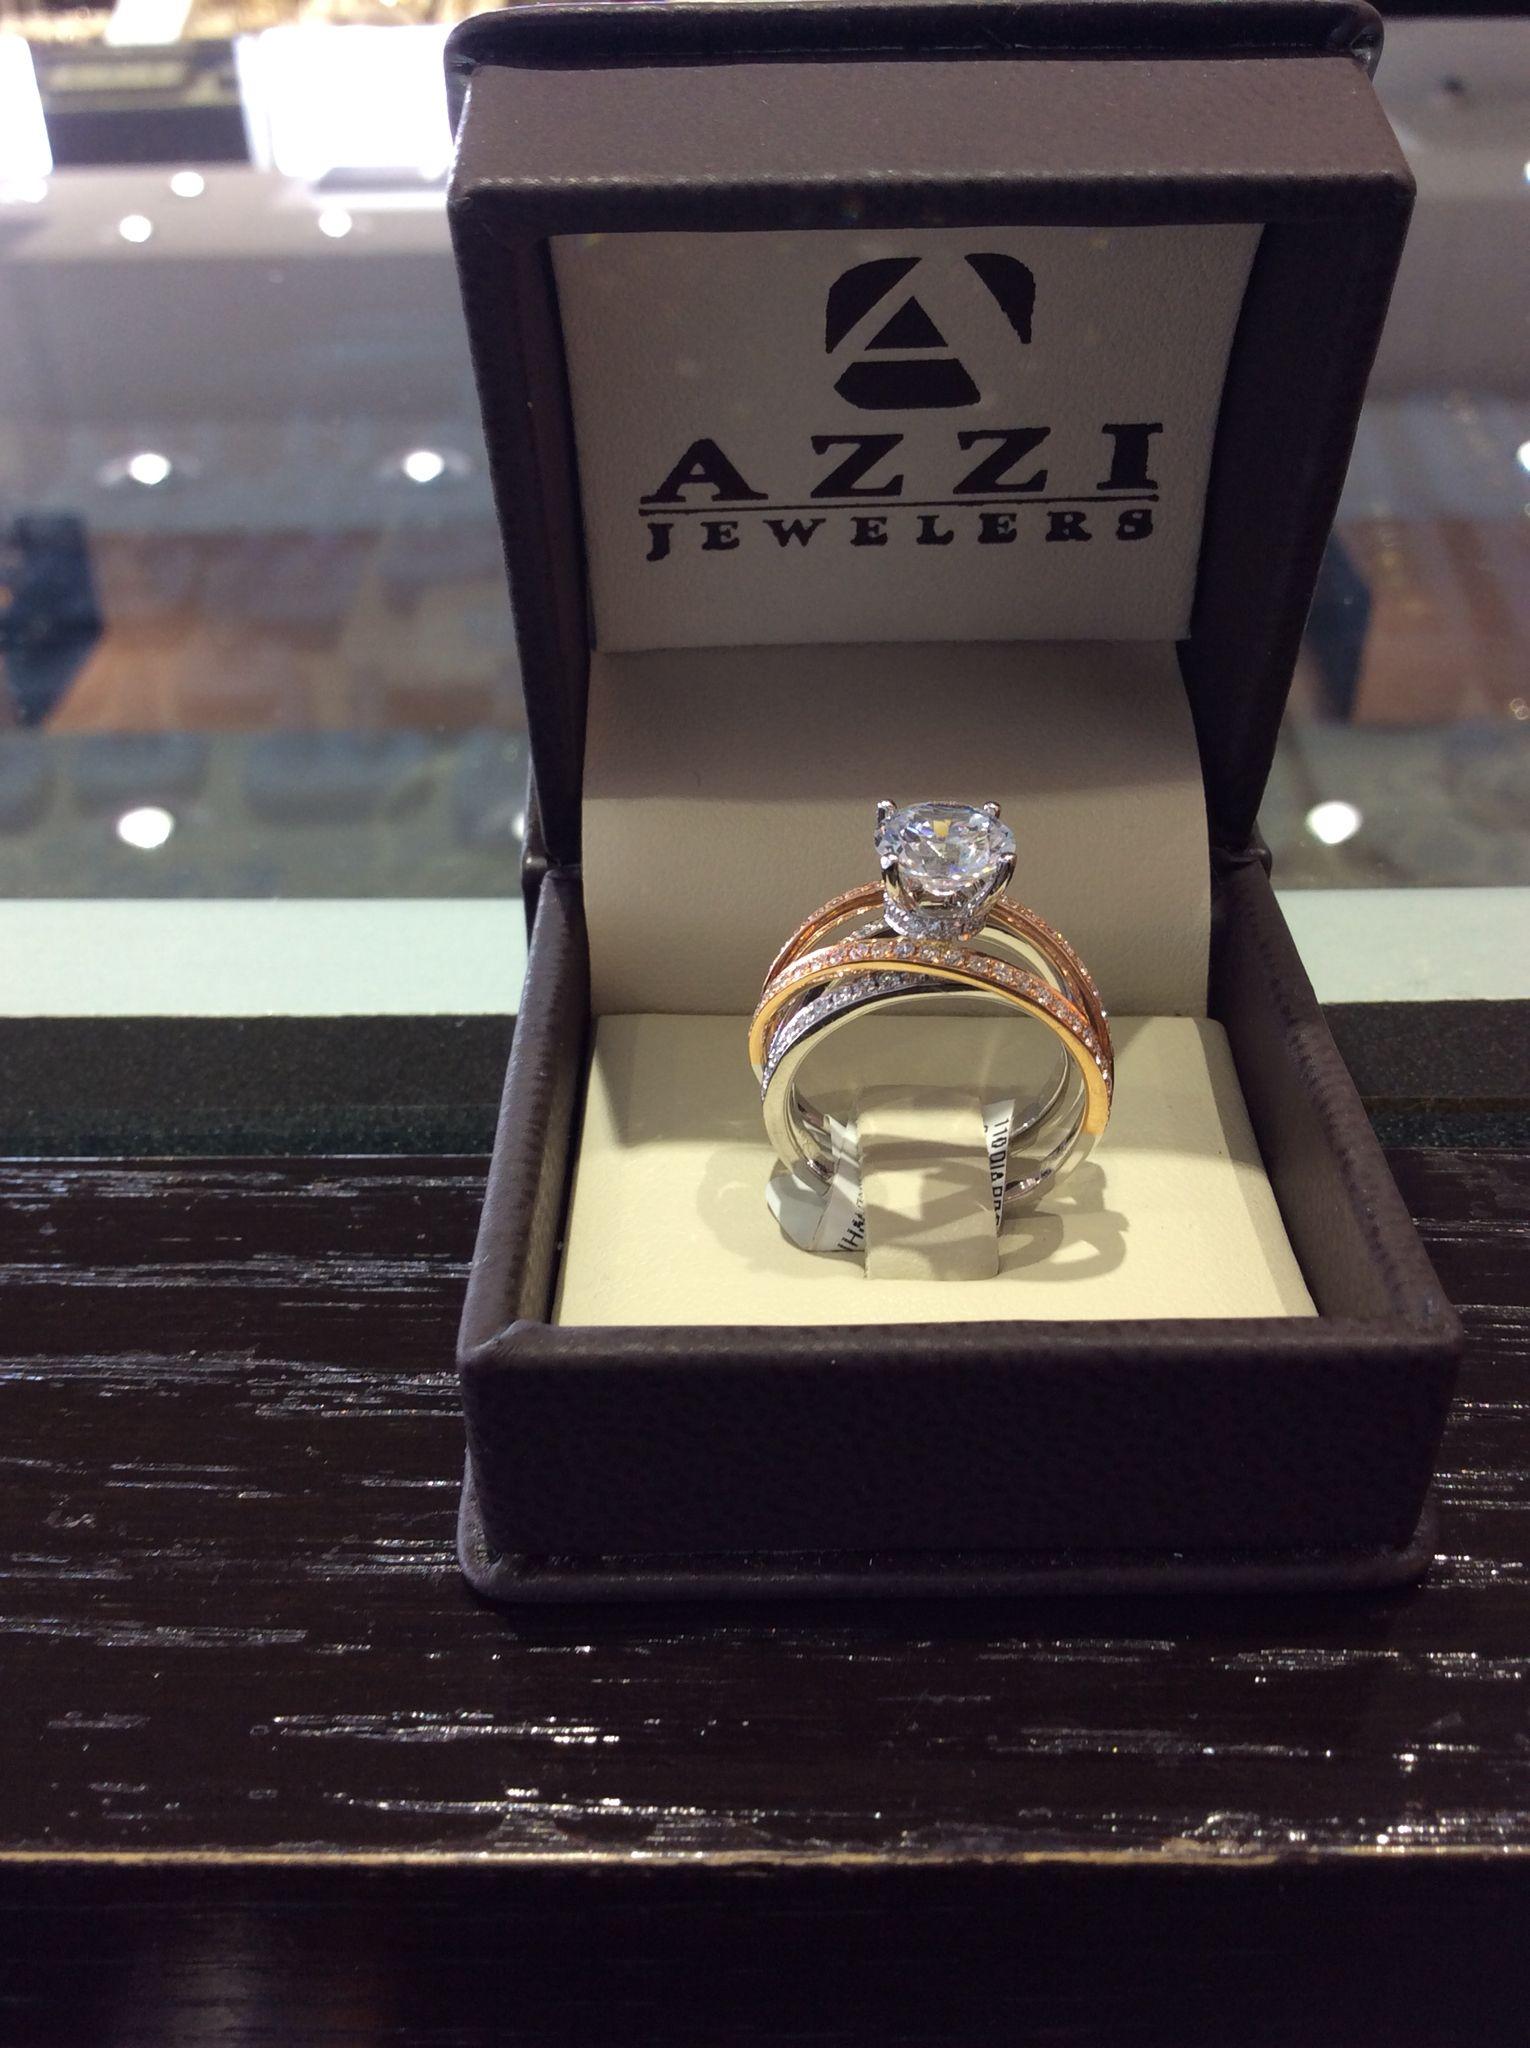 20++ Jewelry stores near lansing mi information